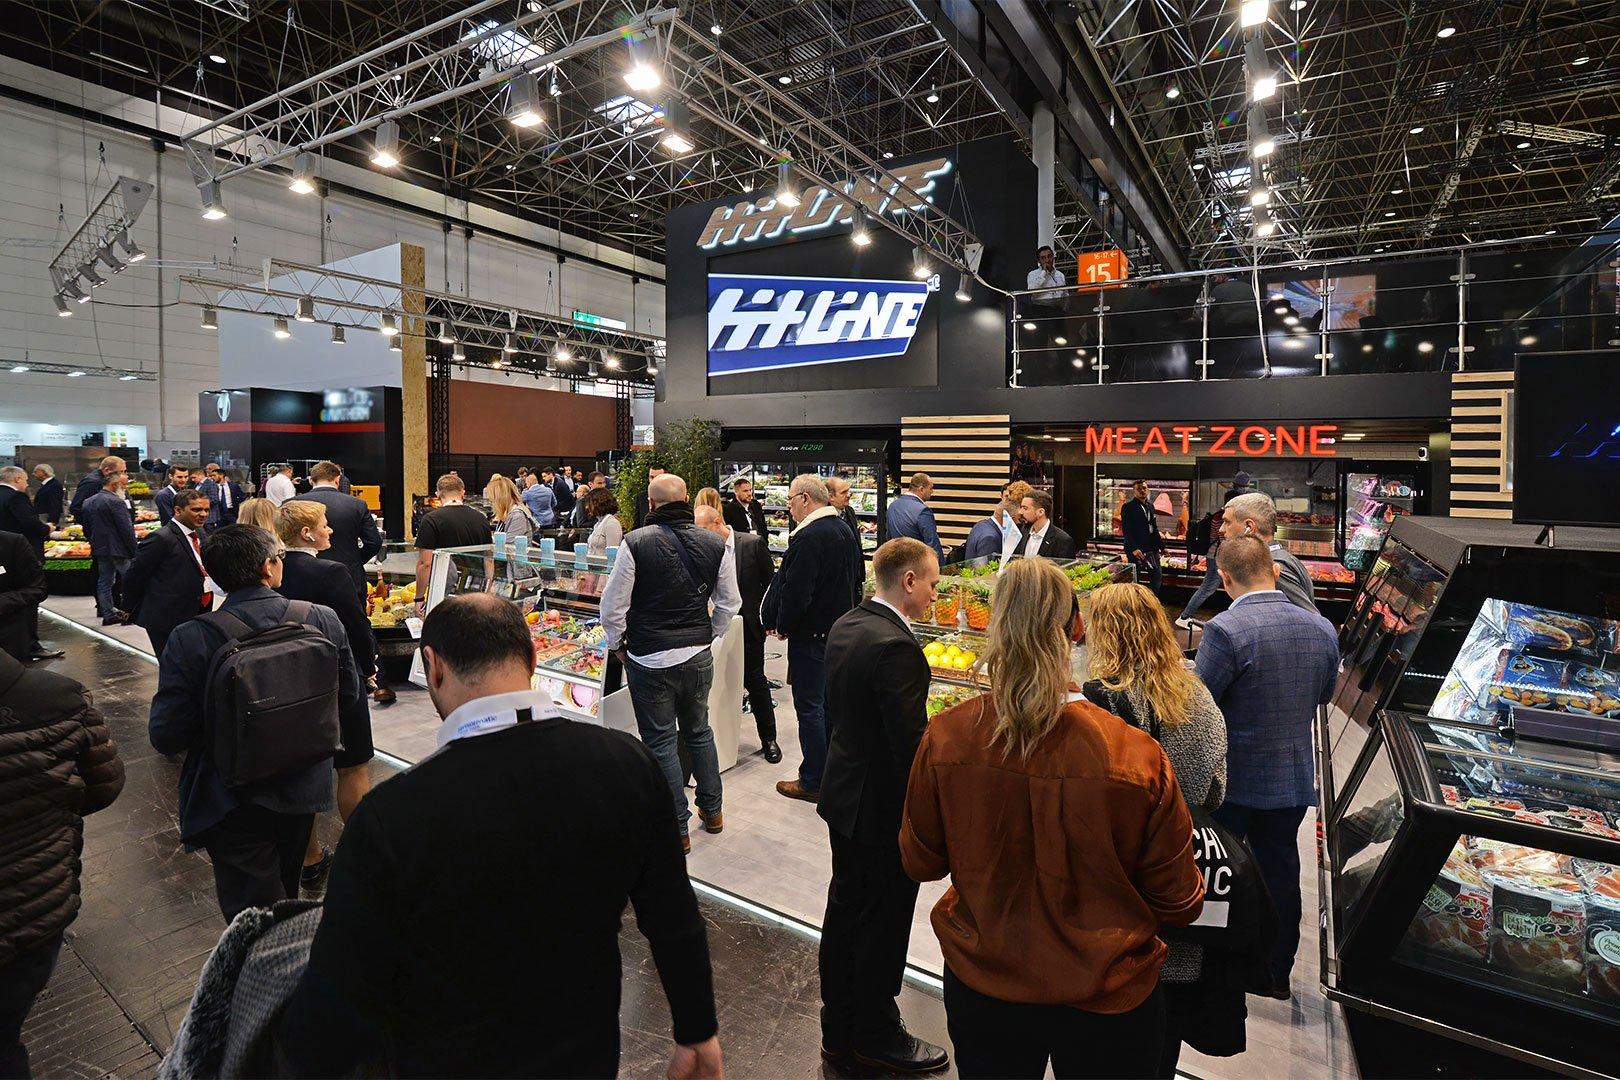 Стенд компании Хитлайн на выставке EuroShop 2020